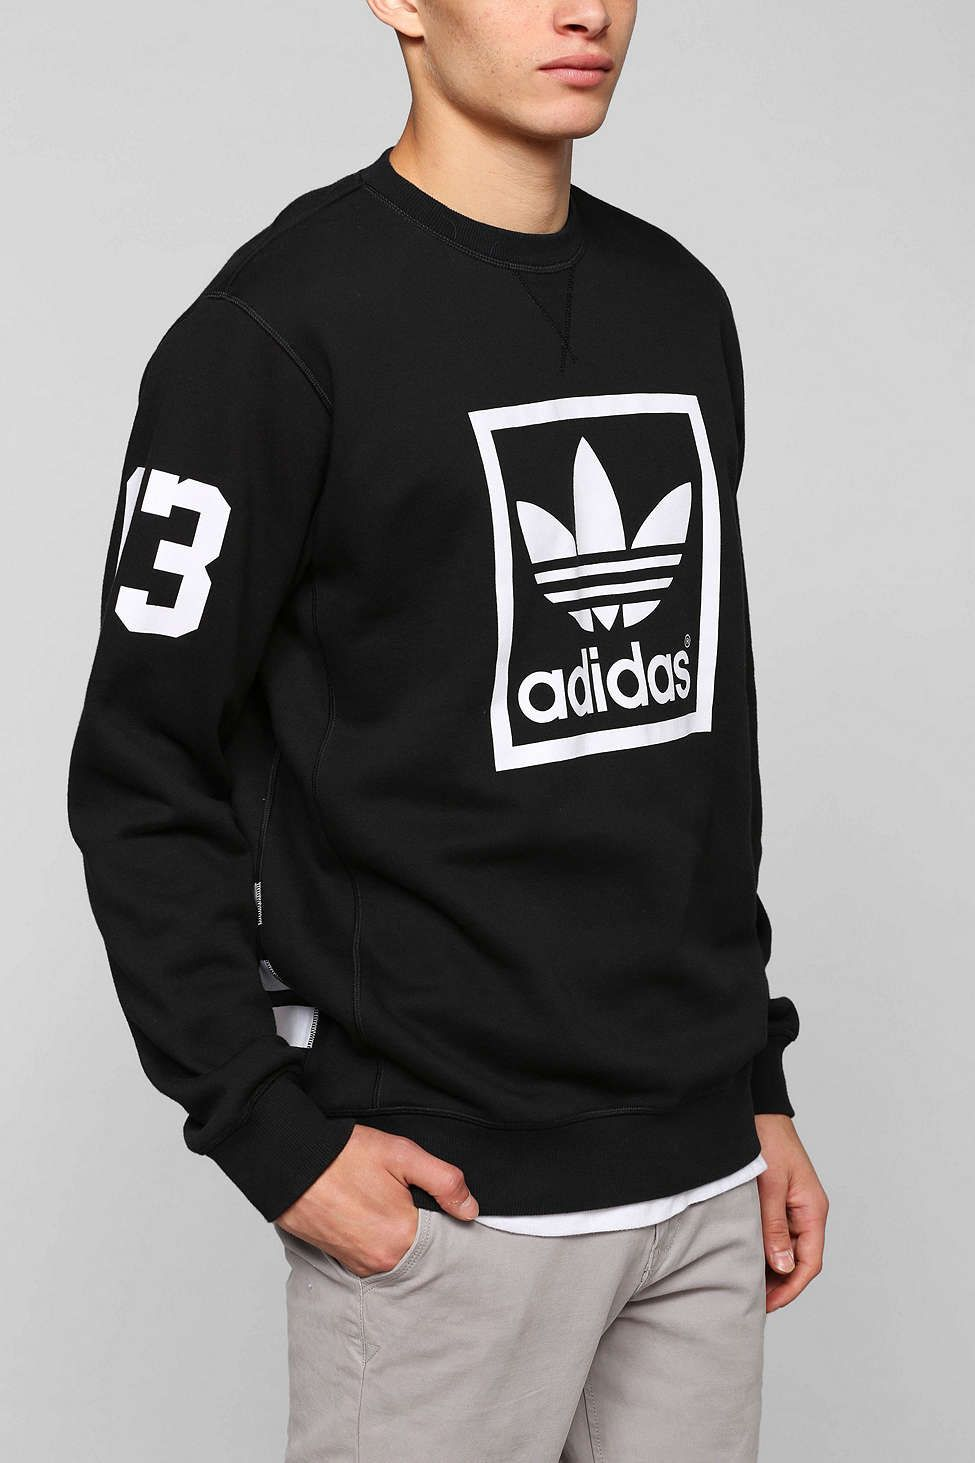 Adidas Originals Trefoil Crew Neck Sweatshirt Addidas Shirts Mens Outfits Sweatshirts